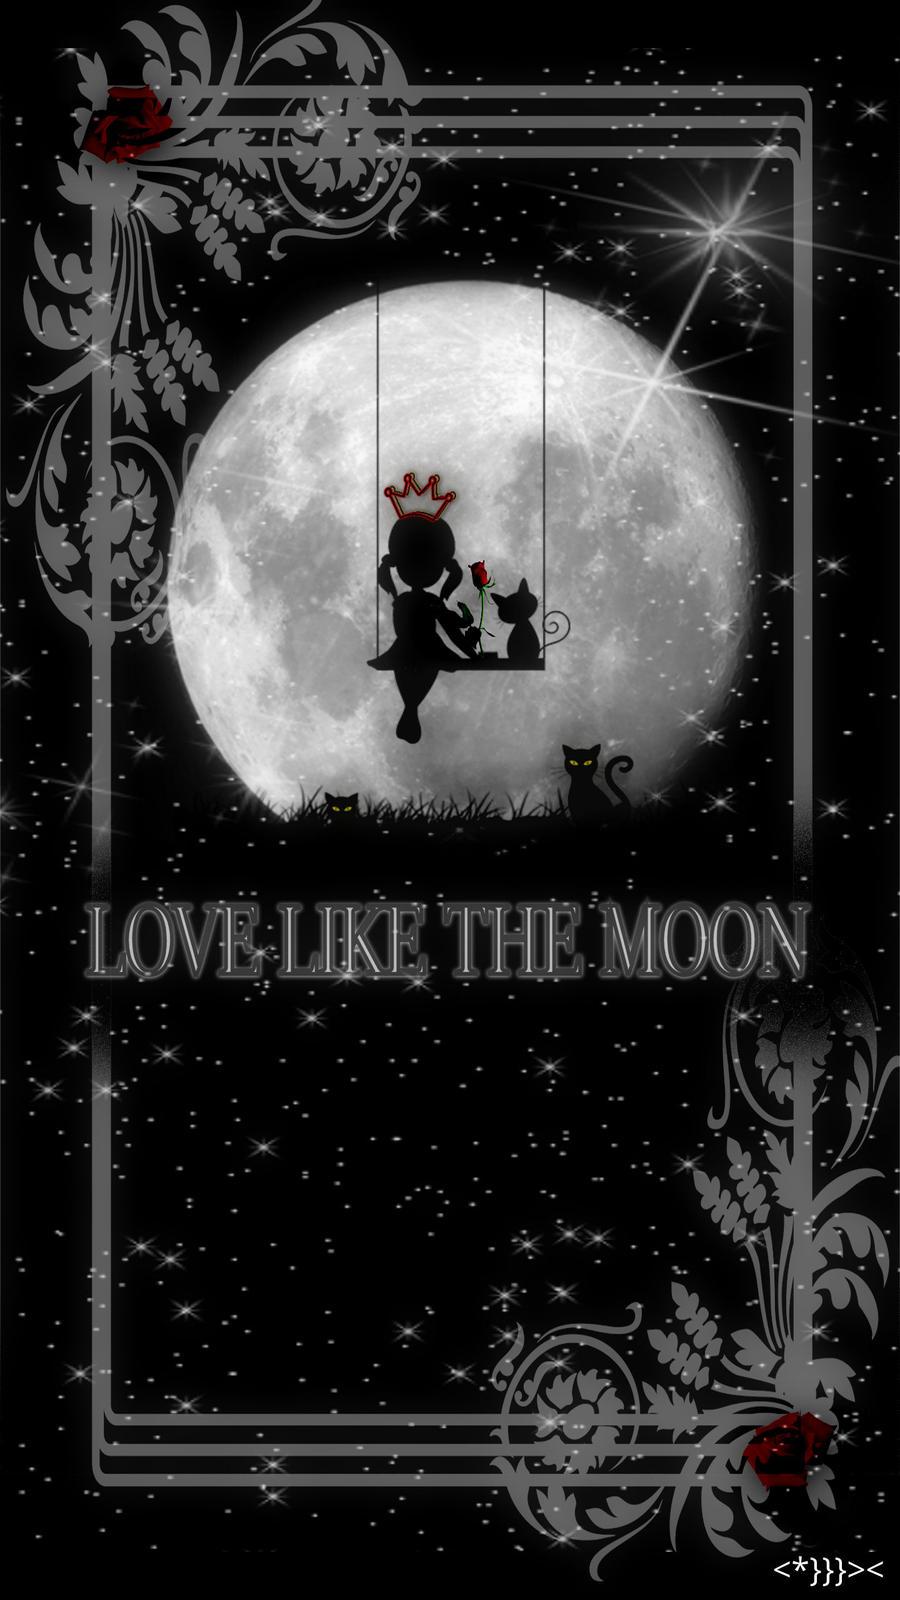 Love Like The Moon Smartphone Wallpaper v2